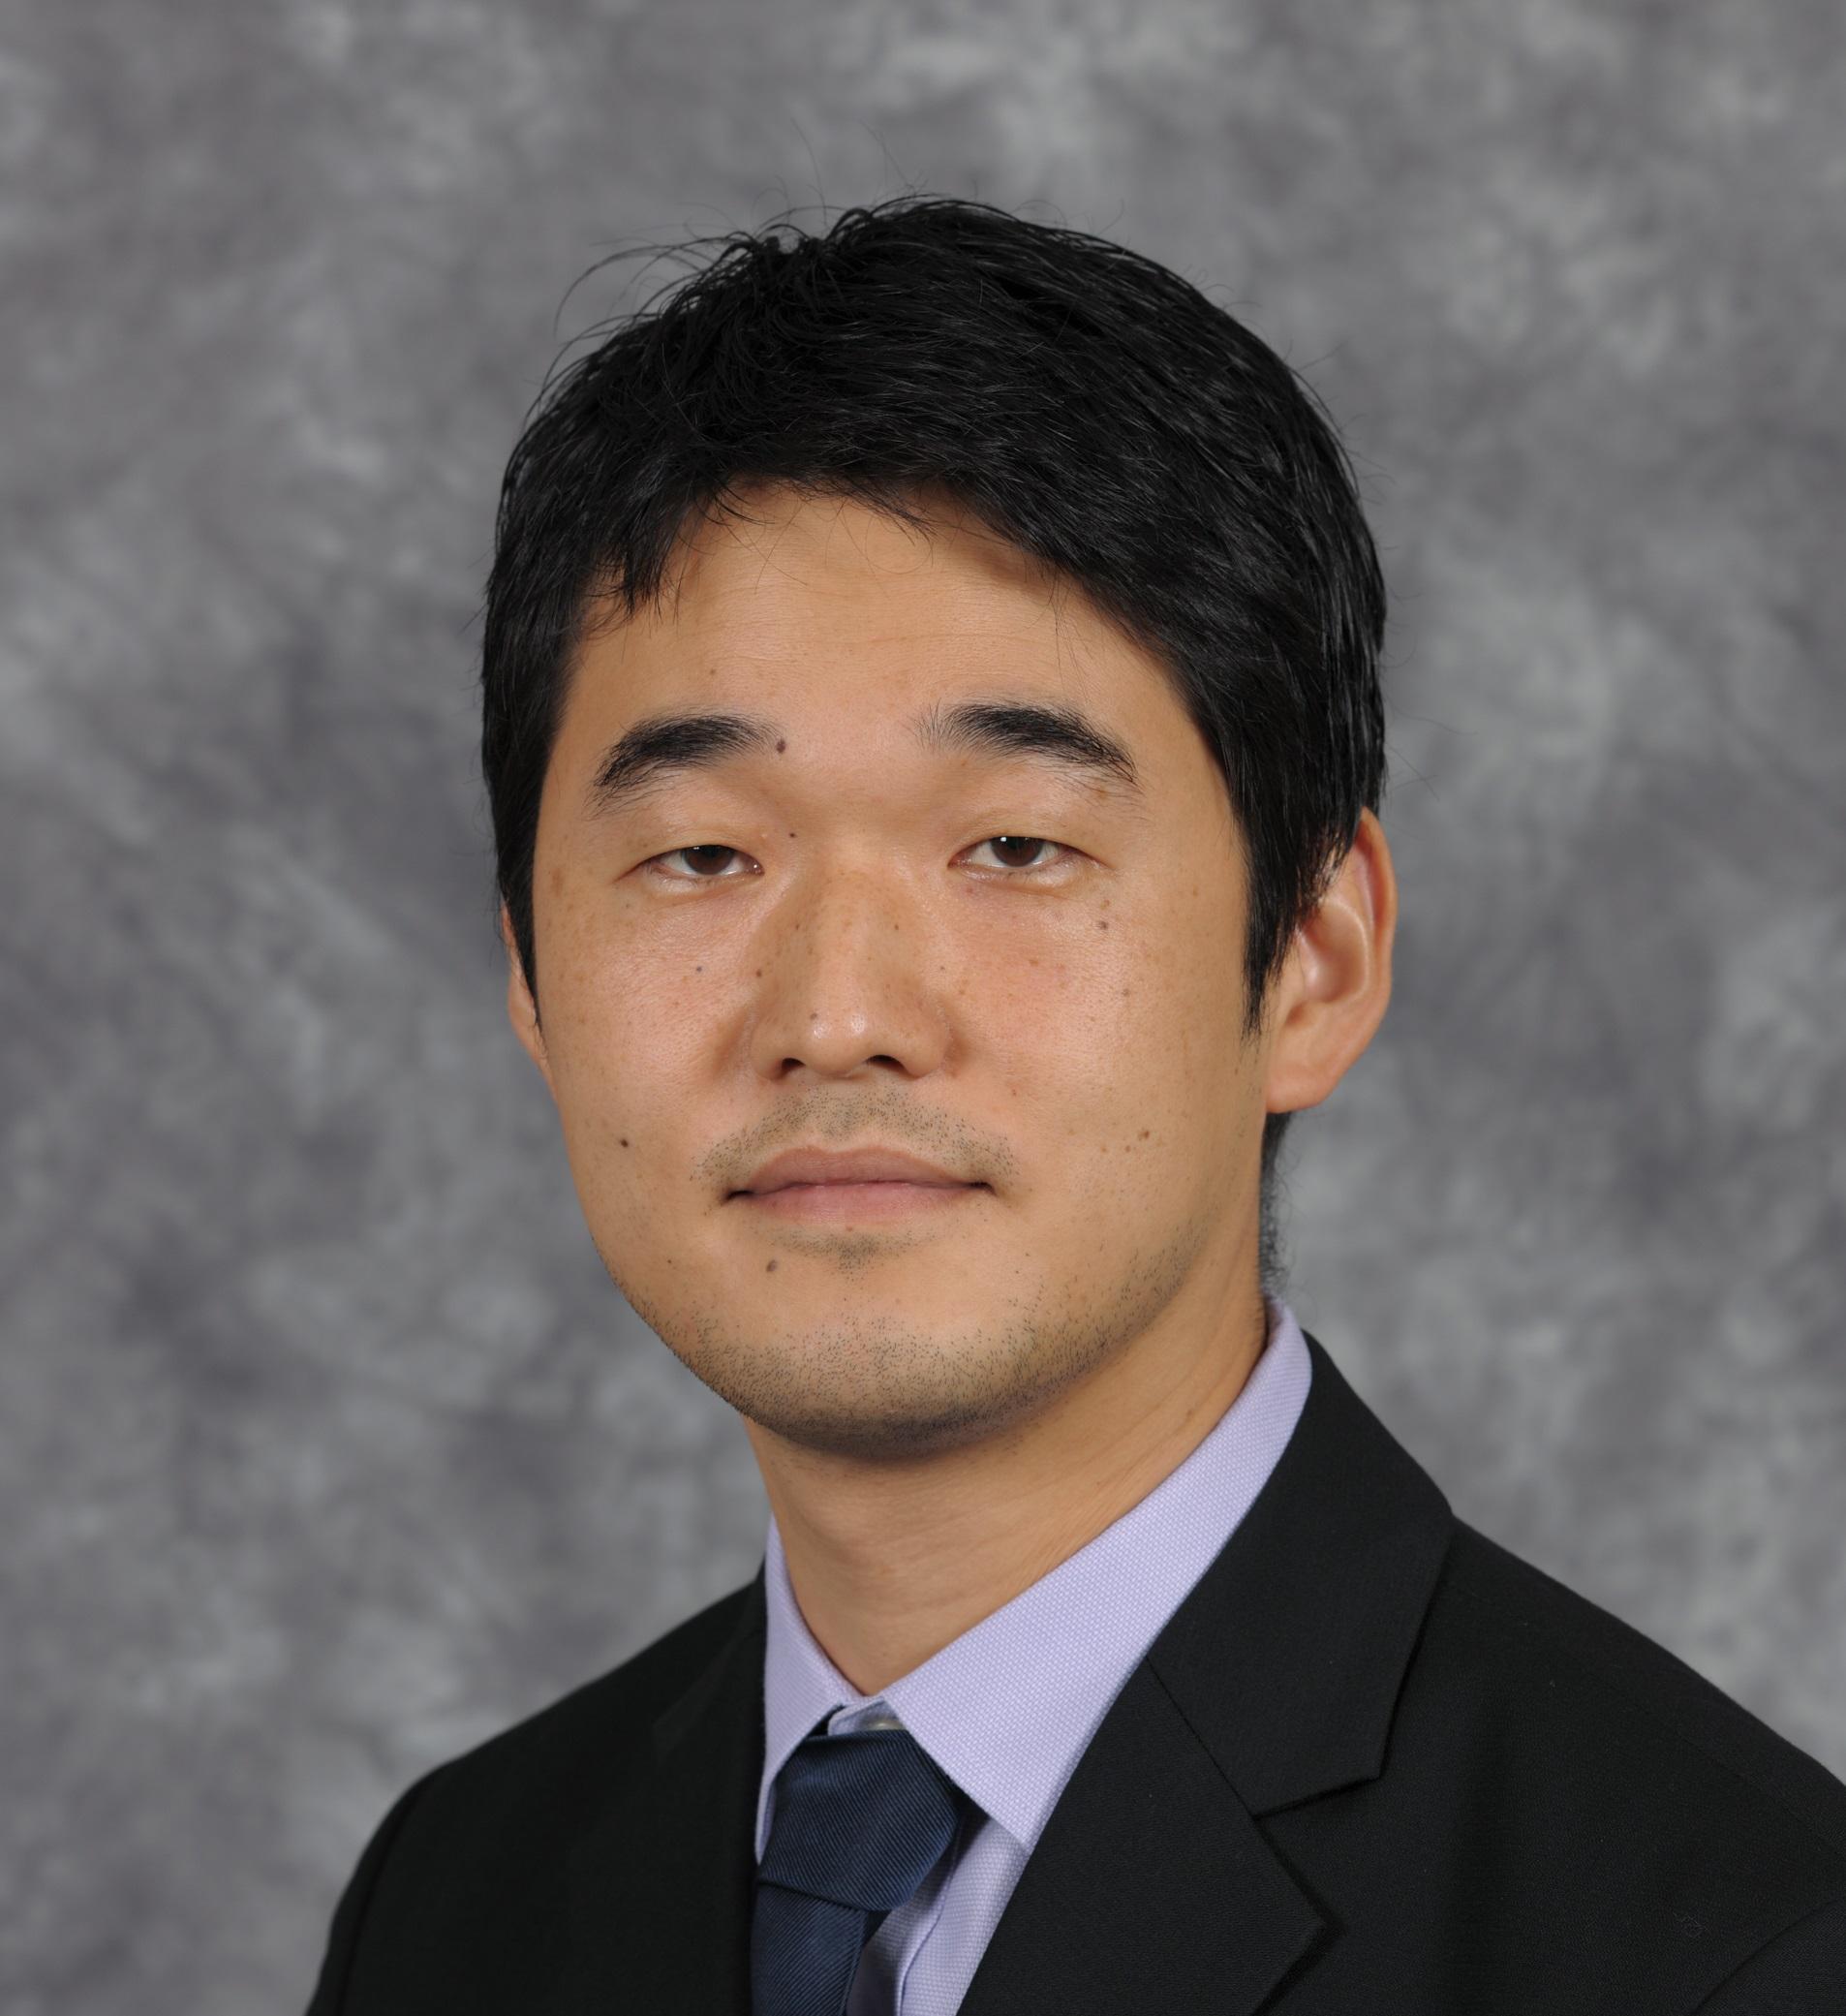 Seung Jae Lee